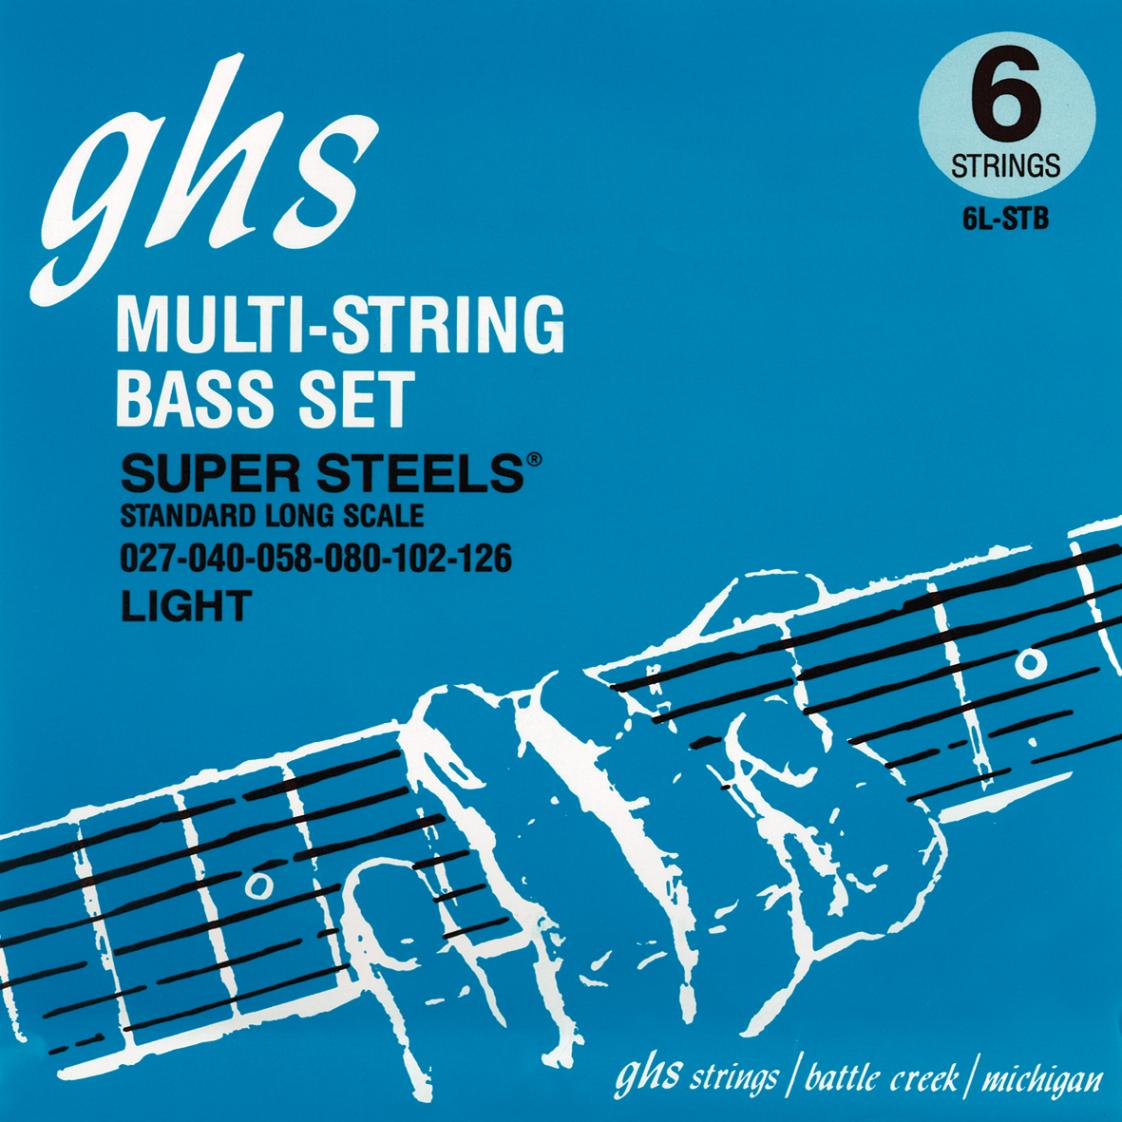 GHS Super Steels 6-L-STB